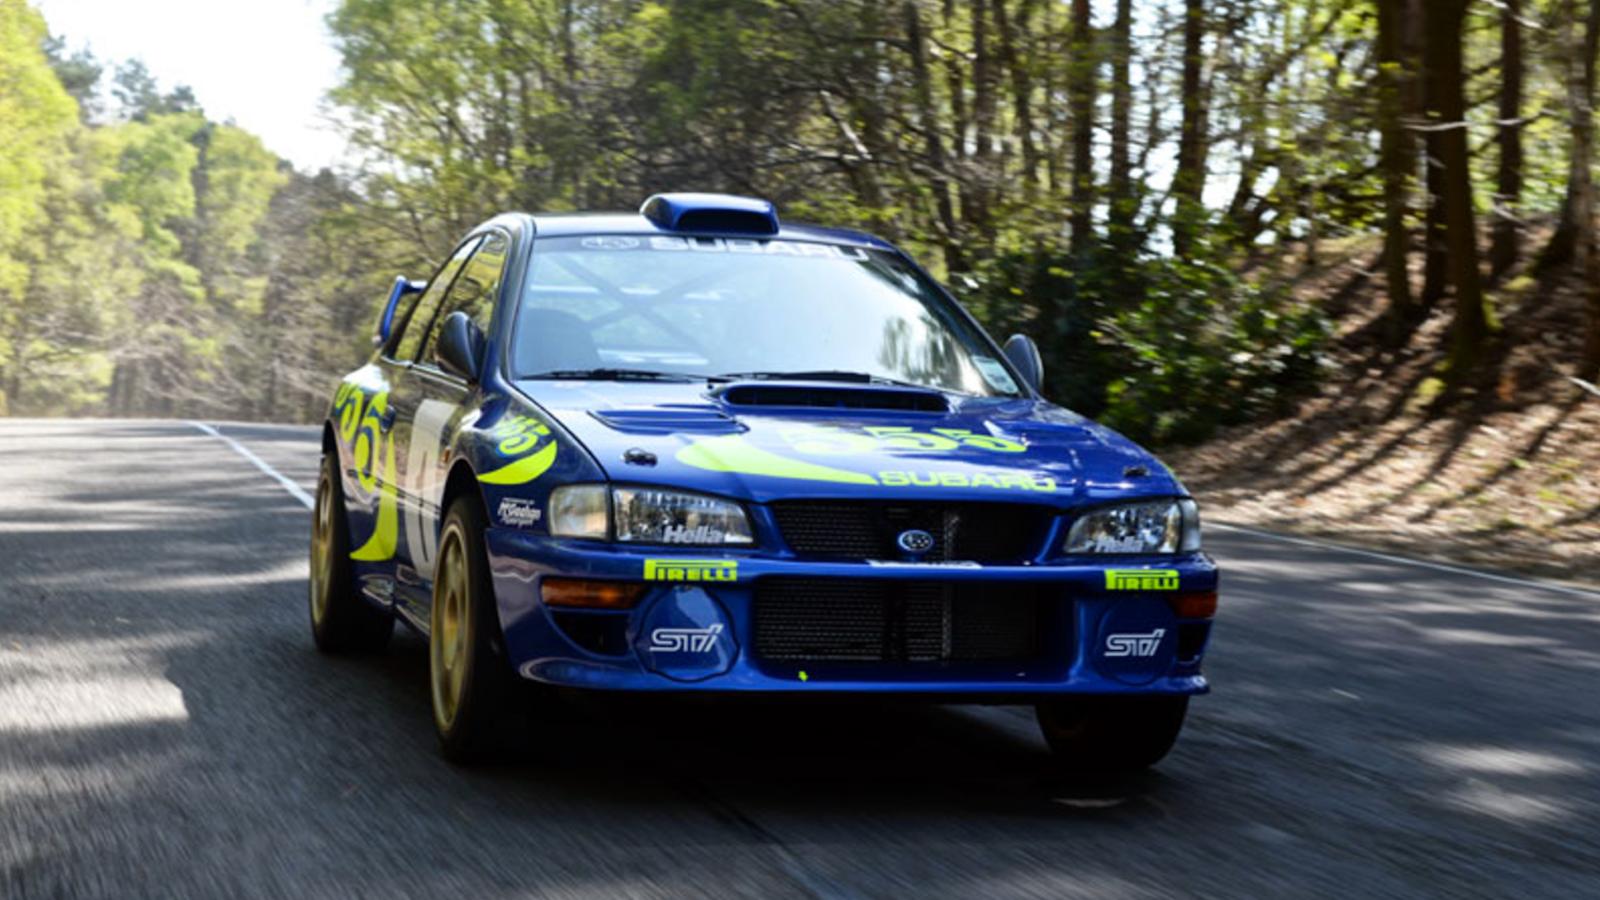 Rally Legend Colin McRae\'s 1997 Subaru Impreza WRC Test Car Sells ...